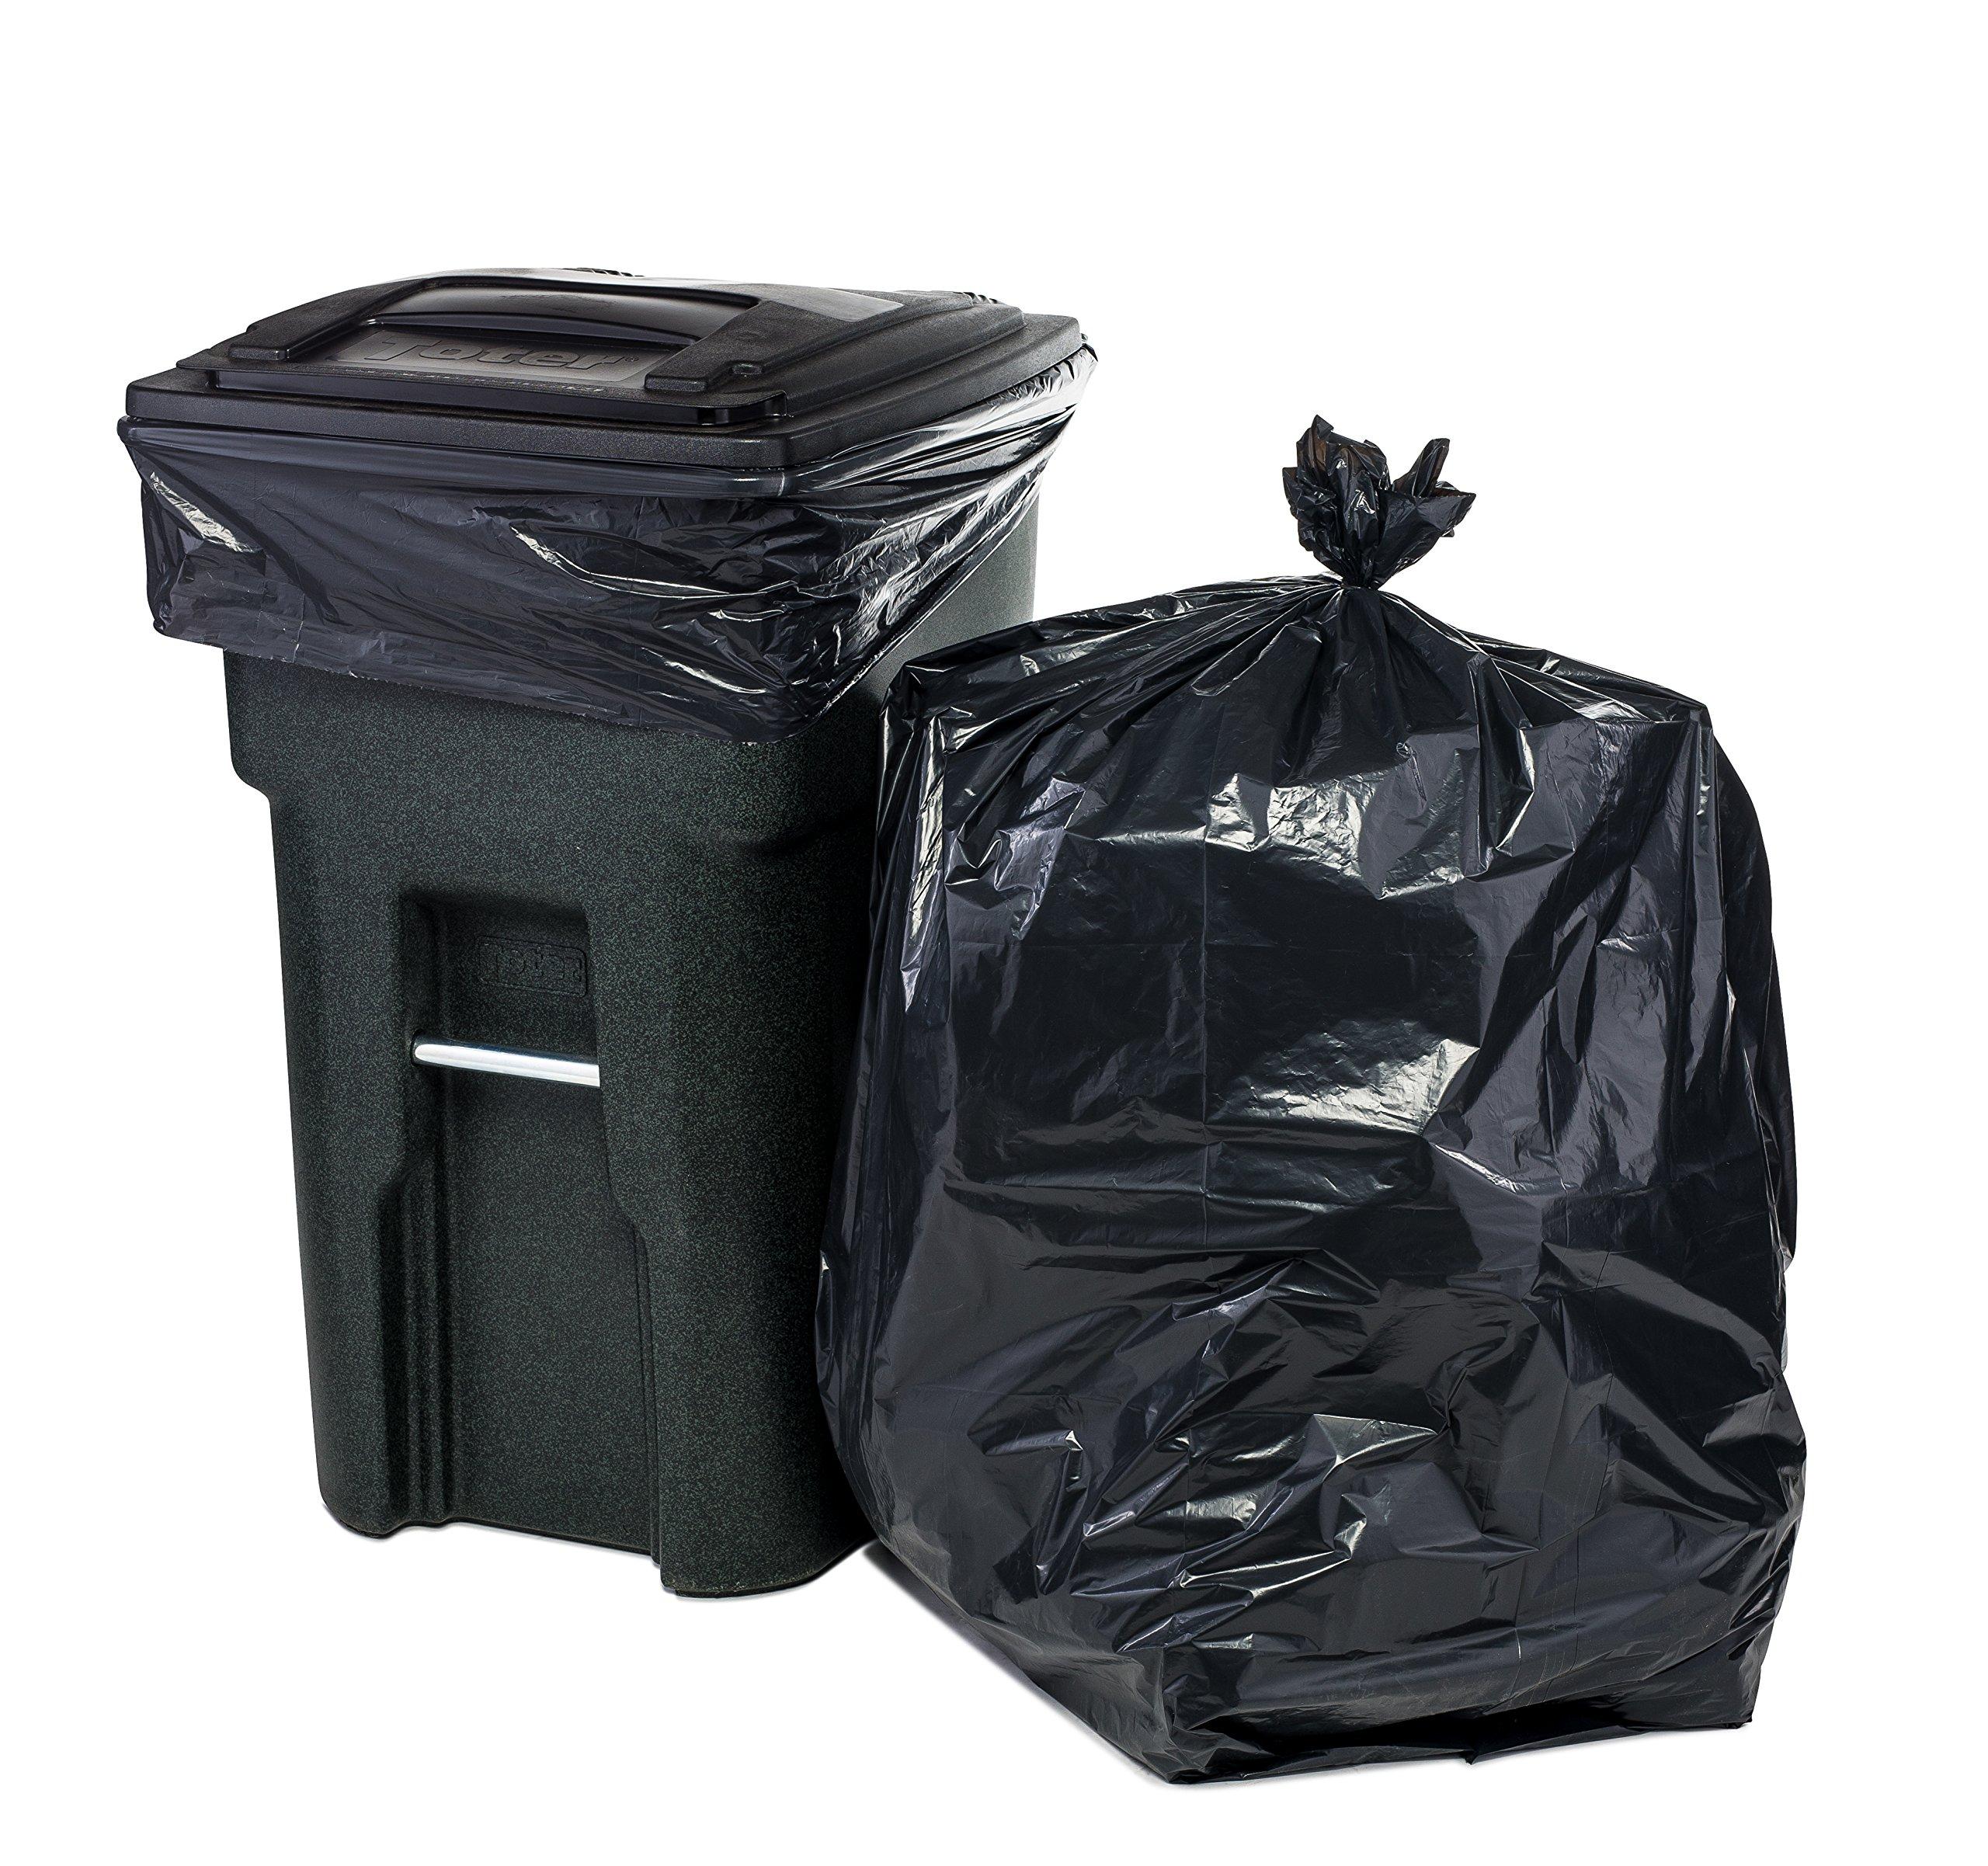 64 Gallon Trash Bags for Toter, Black, 1.5MIL, 50X60, 50 Bags Per Case